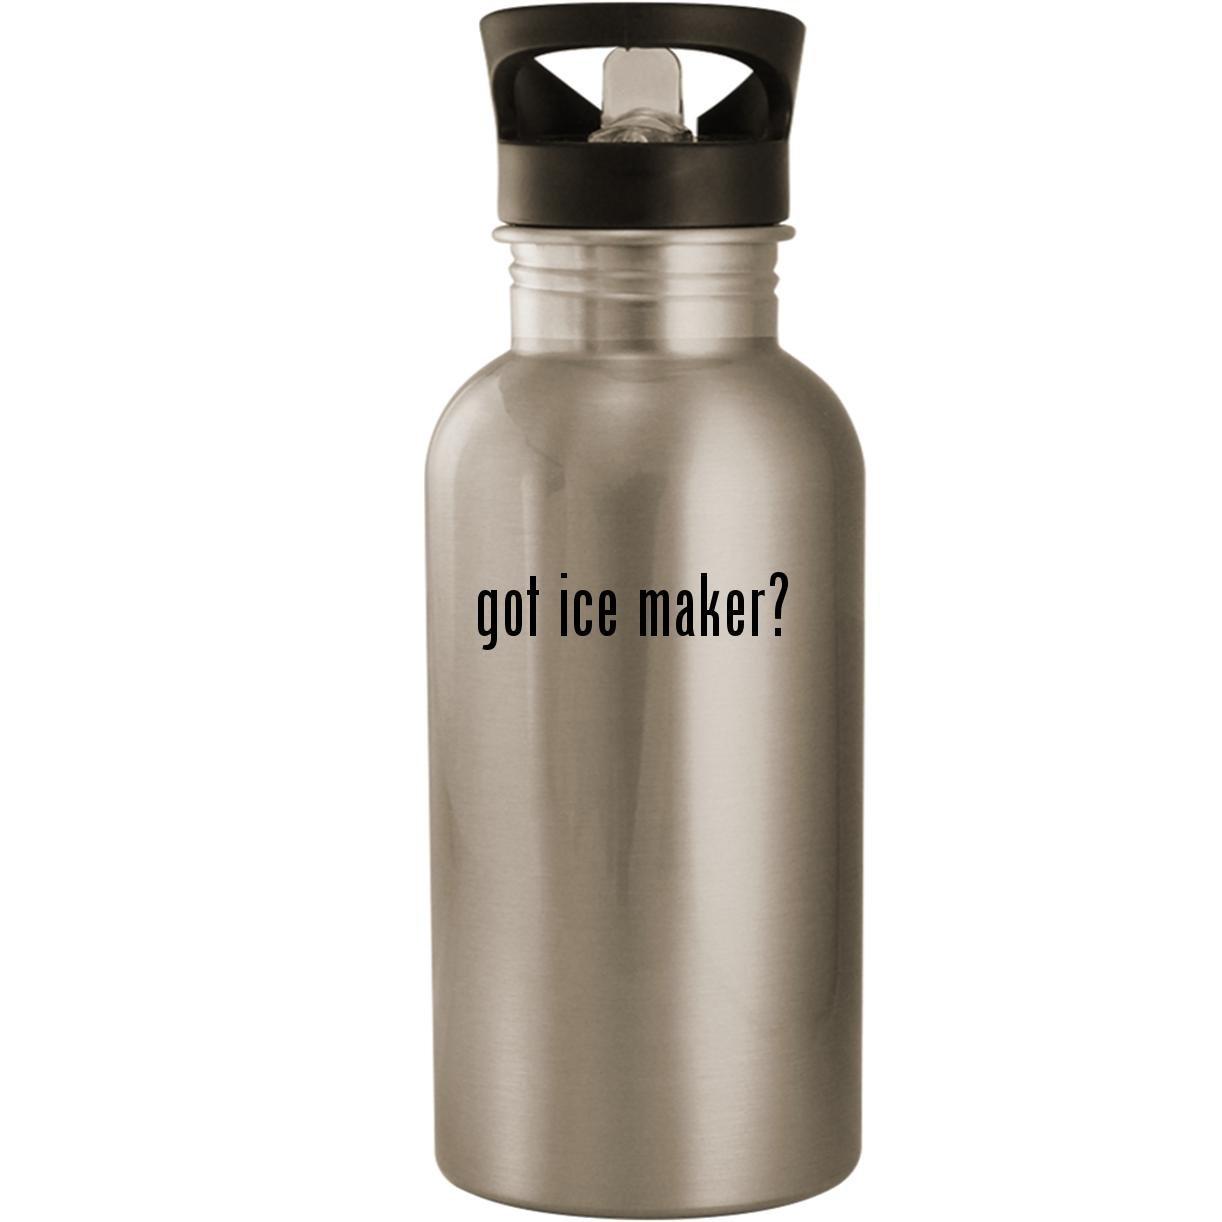 Got Ice Maker  – ステンレススチール20oz Road Ready水ボトル シルバー US-C-07-18-01-093386-04-26-18-26 B07FMGJ7ZY シルバー